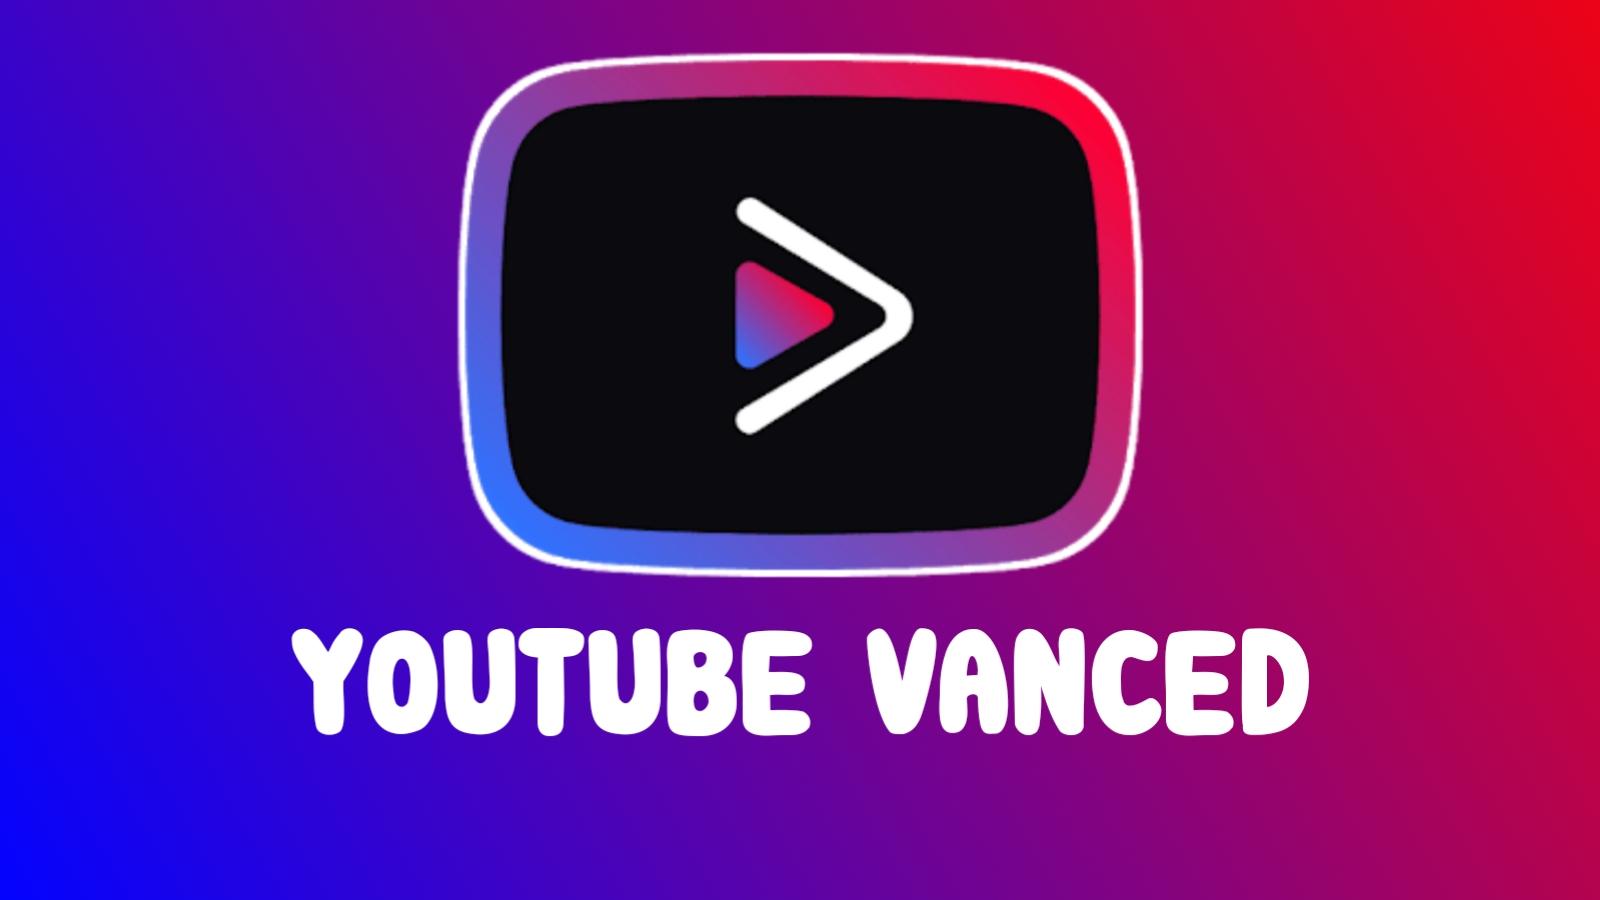 Youtube Vanced - droidl.com